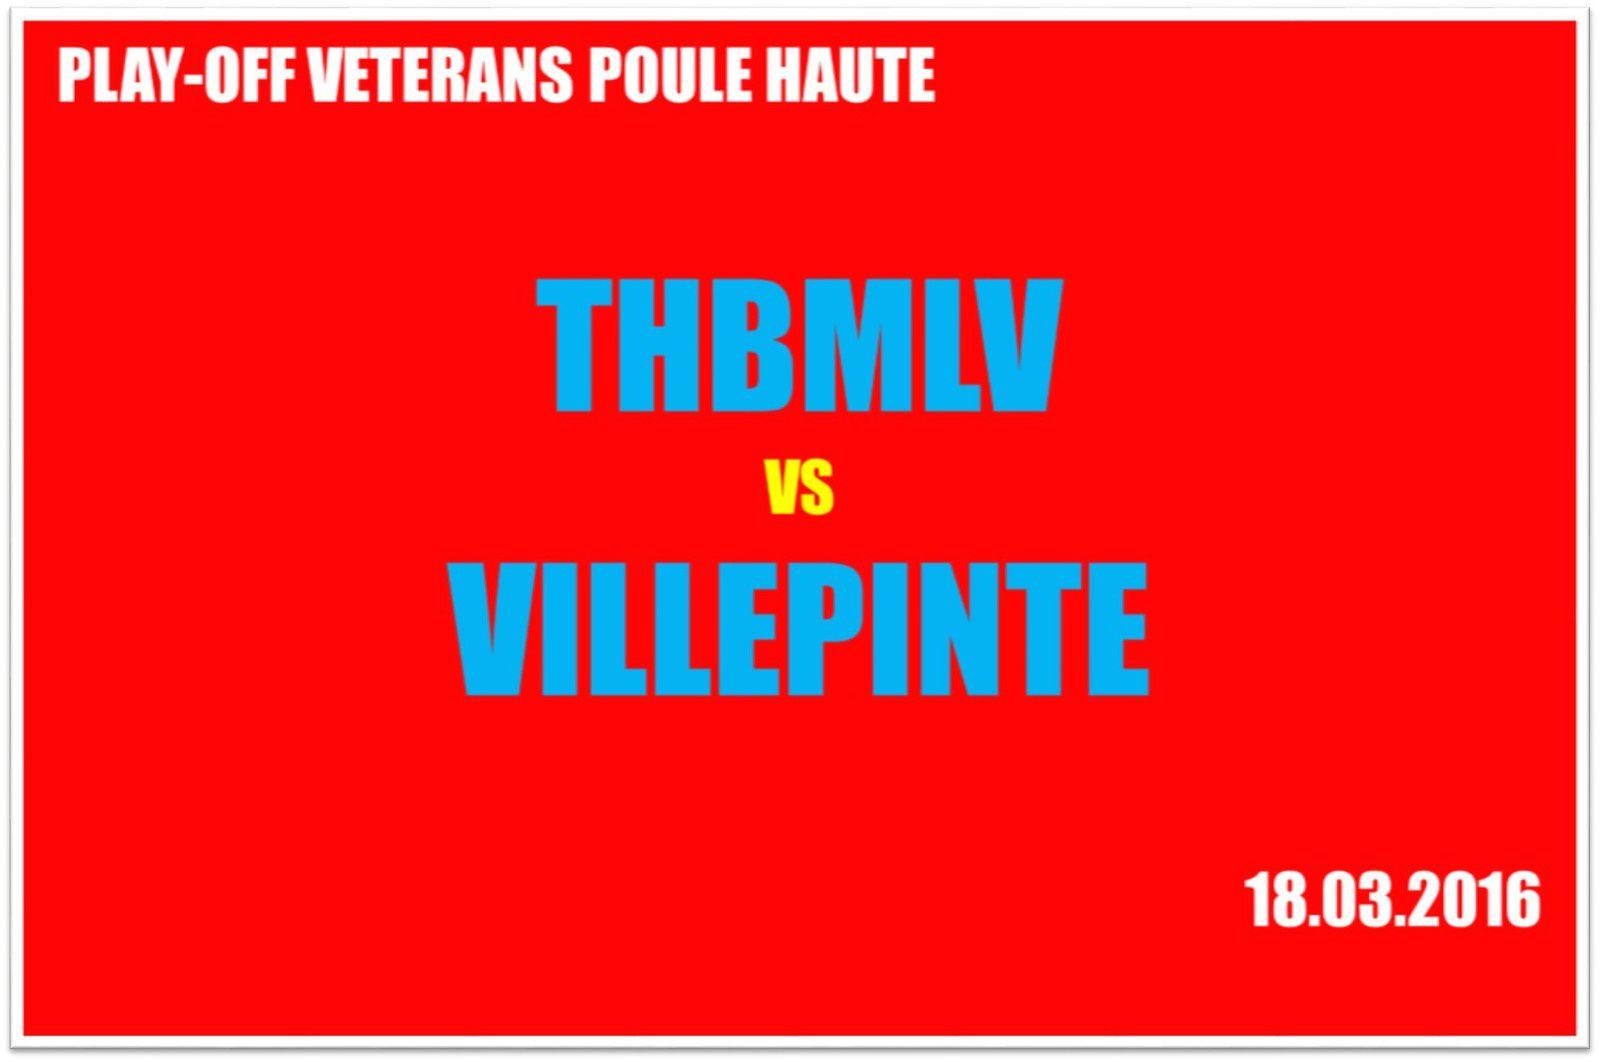 Vétérans - THBMLV vs VILLEPINTE (18.03.2016)